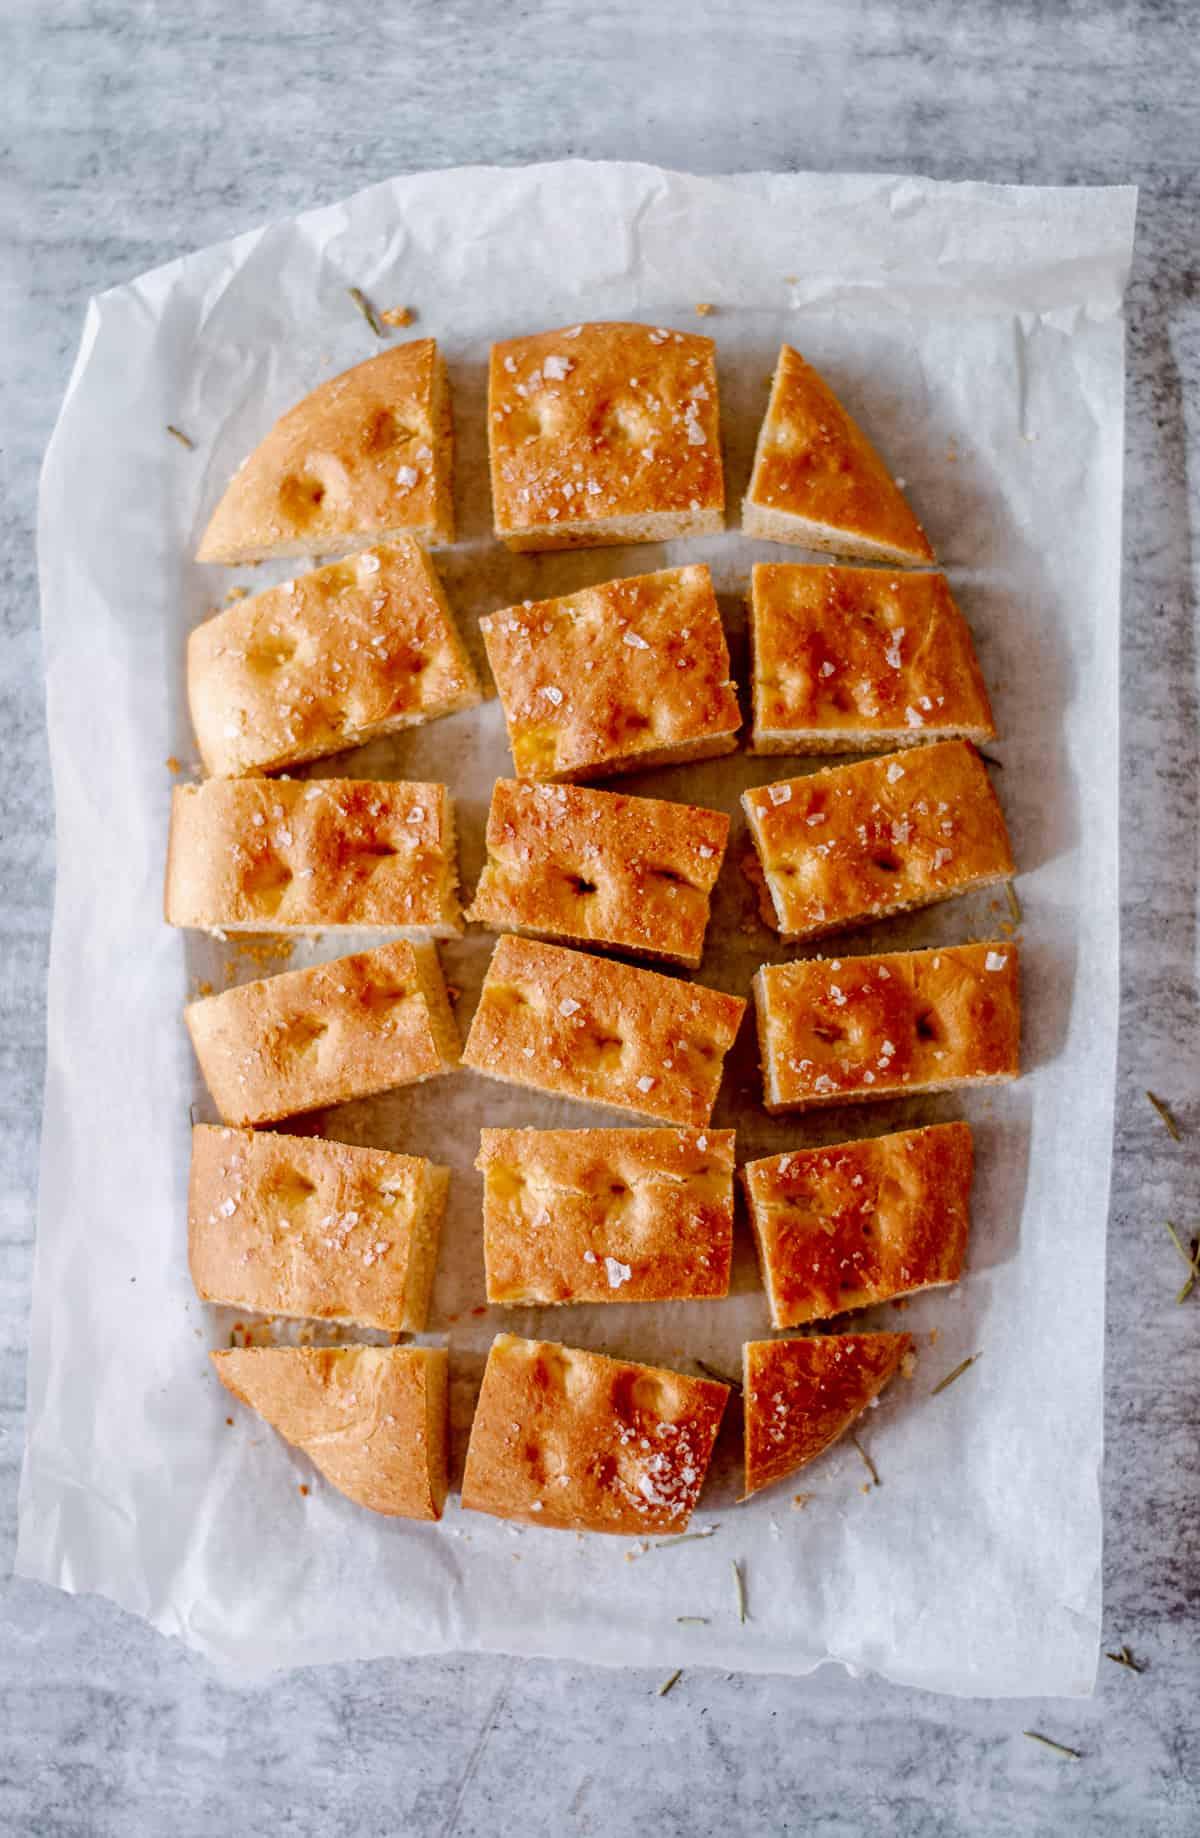 Homemade Focaccia bread cut into slices